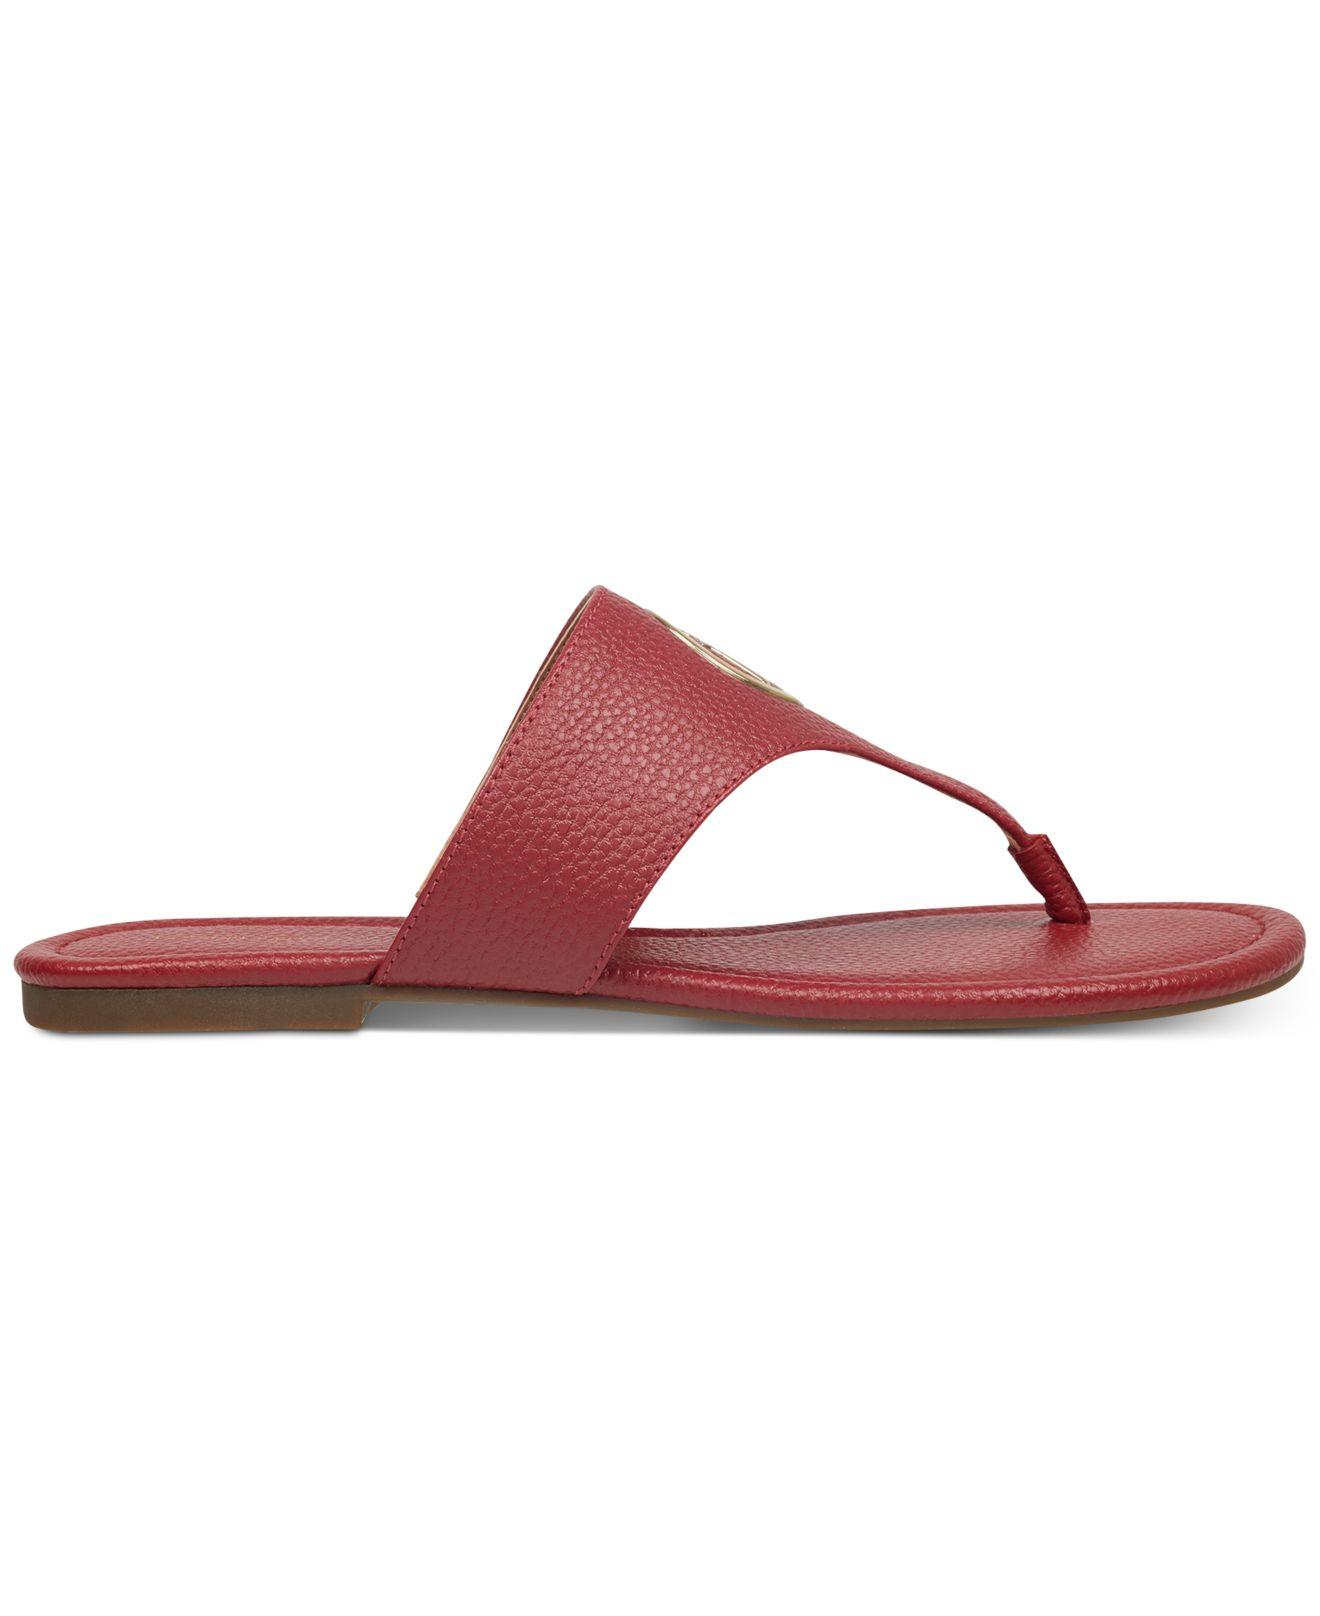 aaf8d7dff7b Lyst - Tommy Hilfiger Sinder Flat Sandals in Red